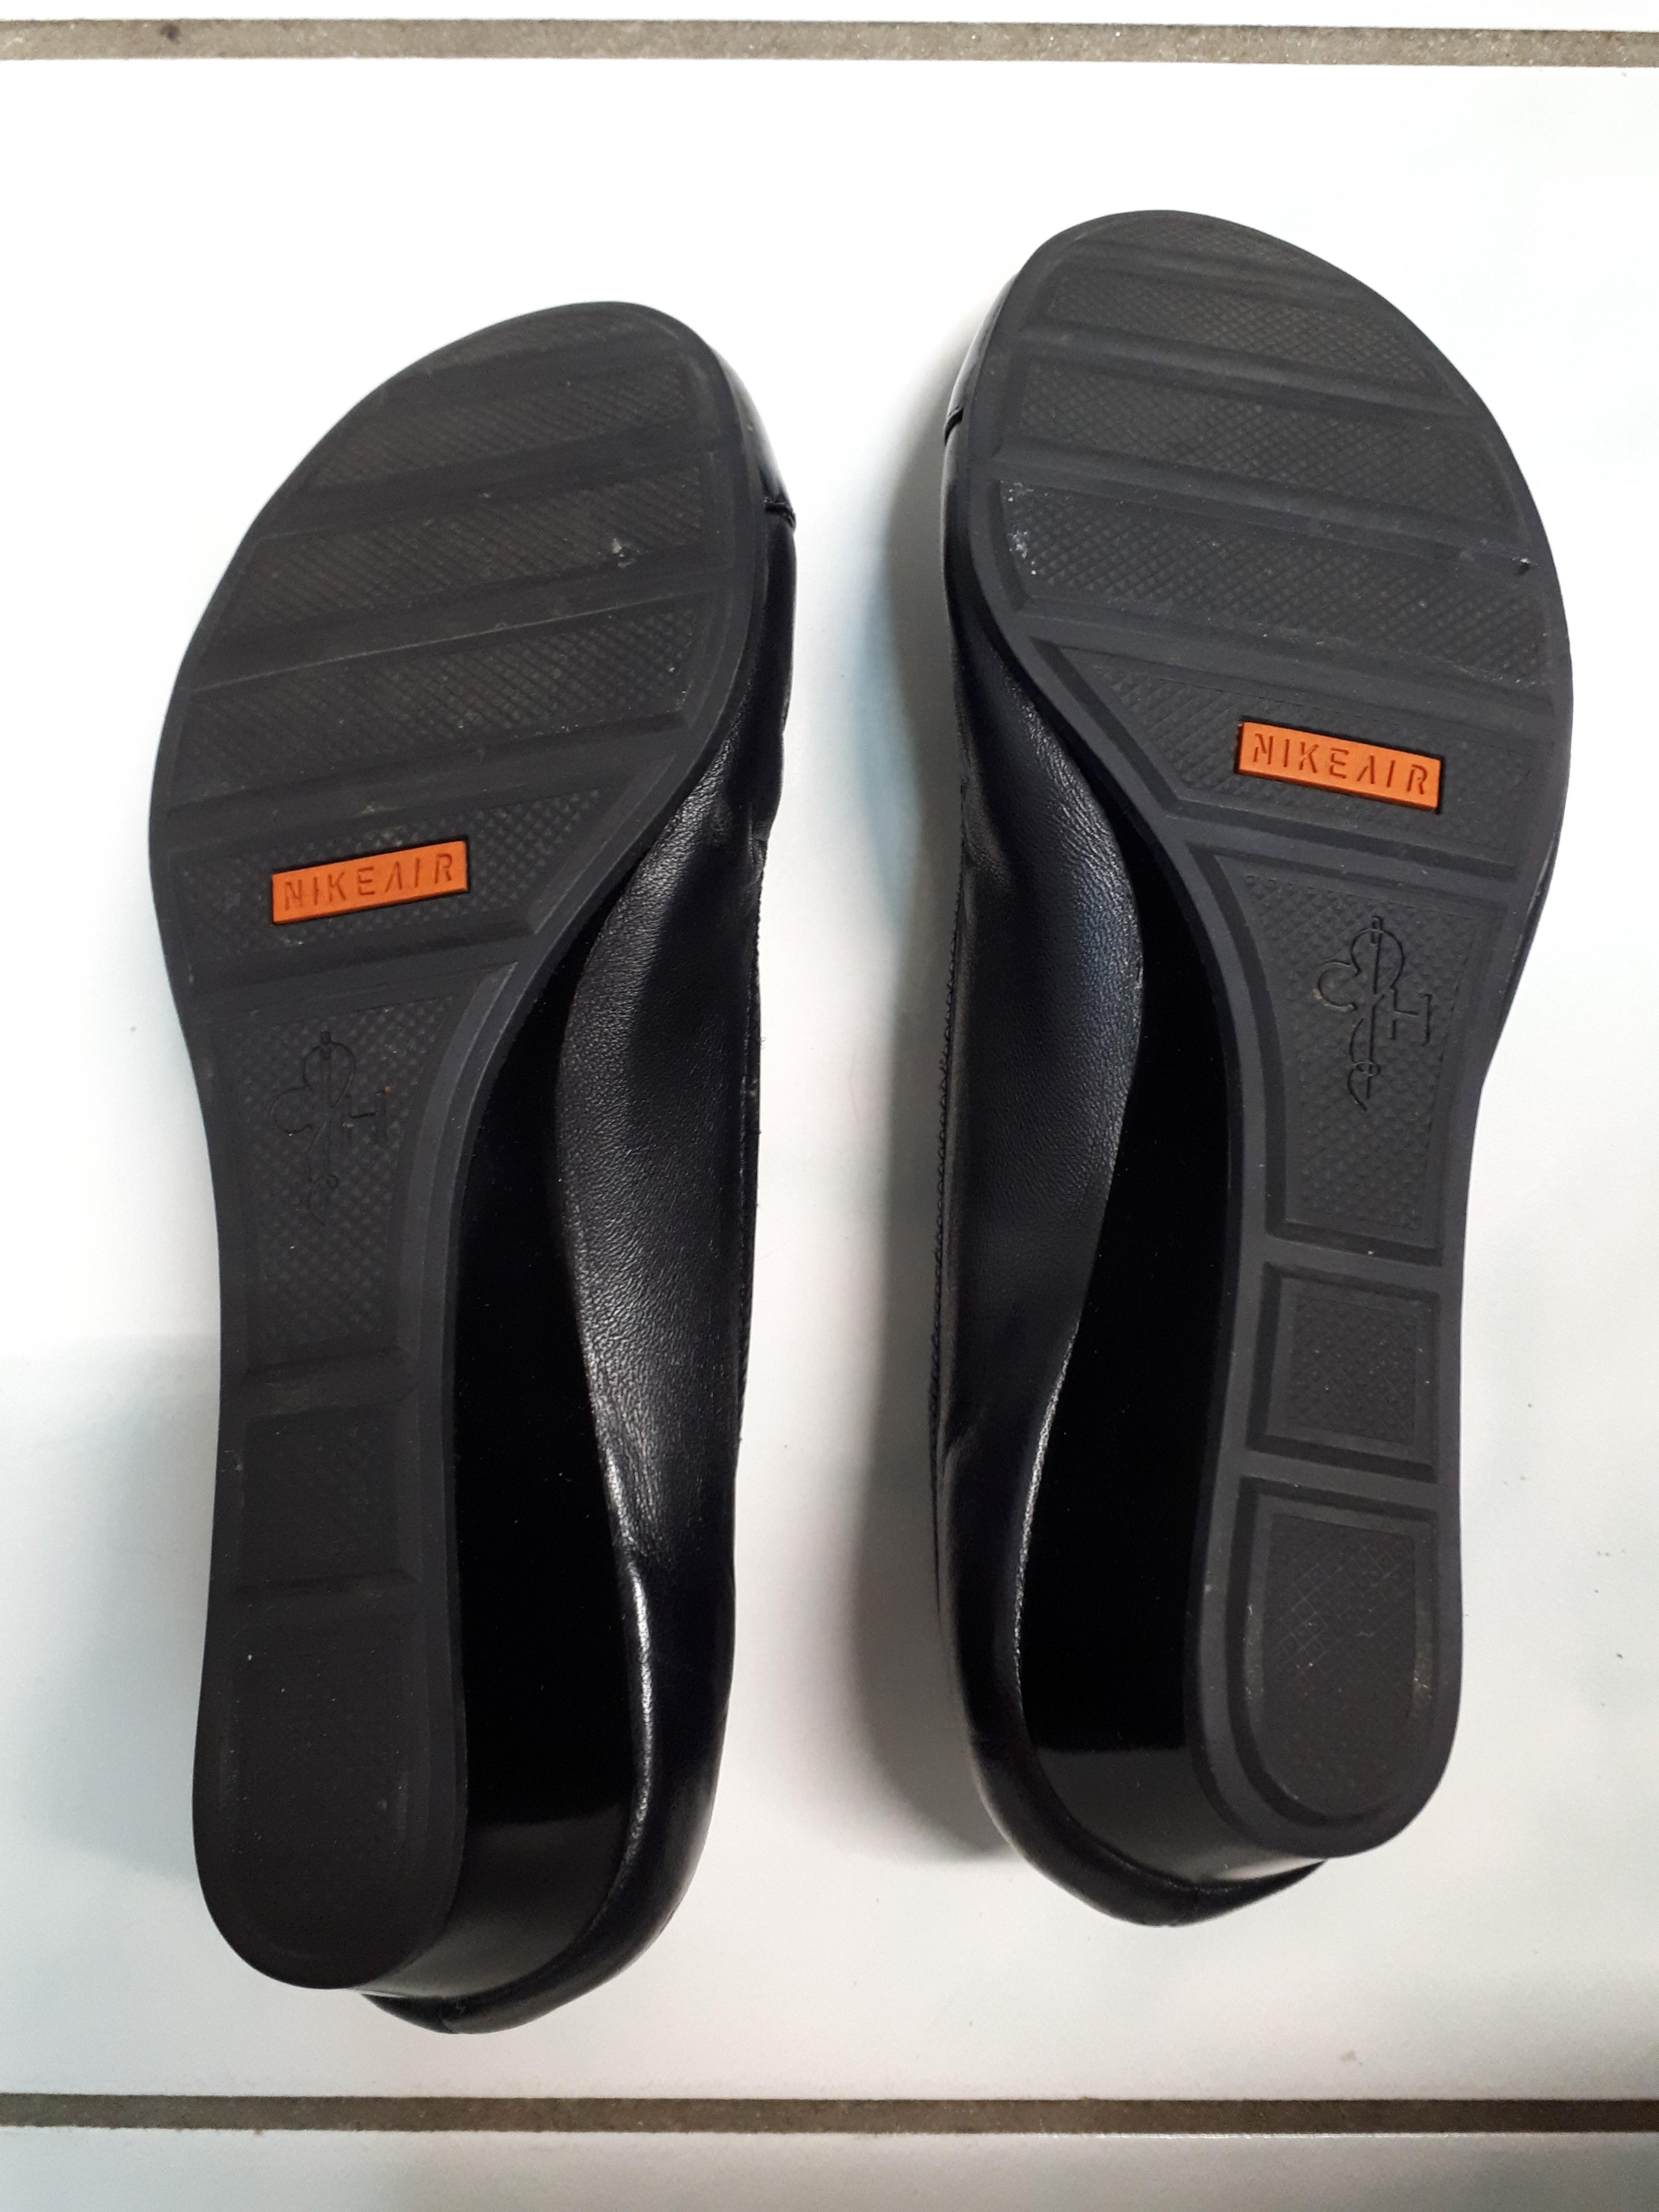 Cole Haan - Nike Air | Slip On Round Toe Wedge Pumps